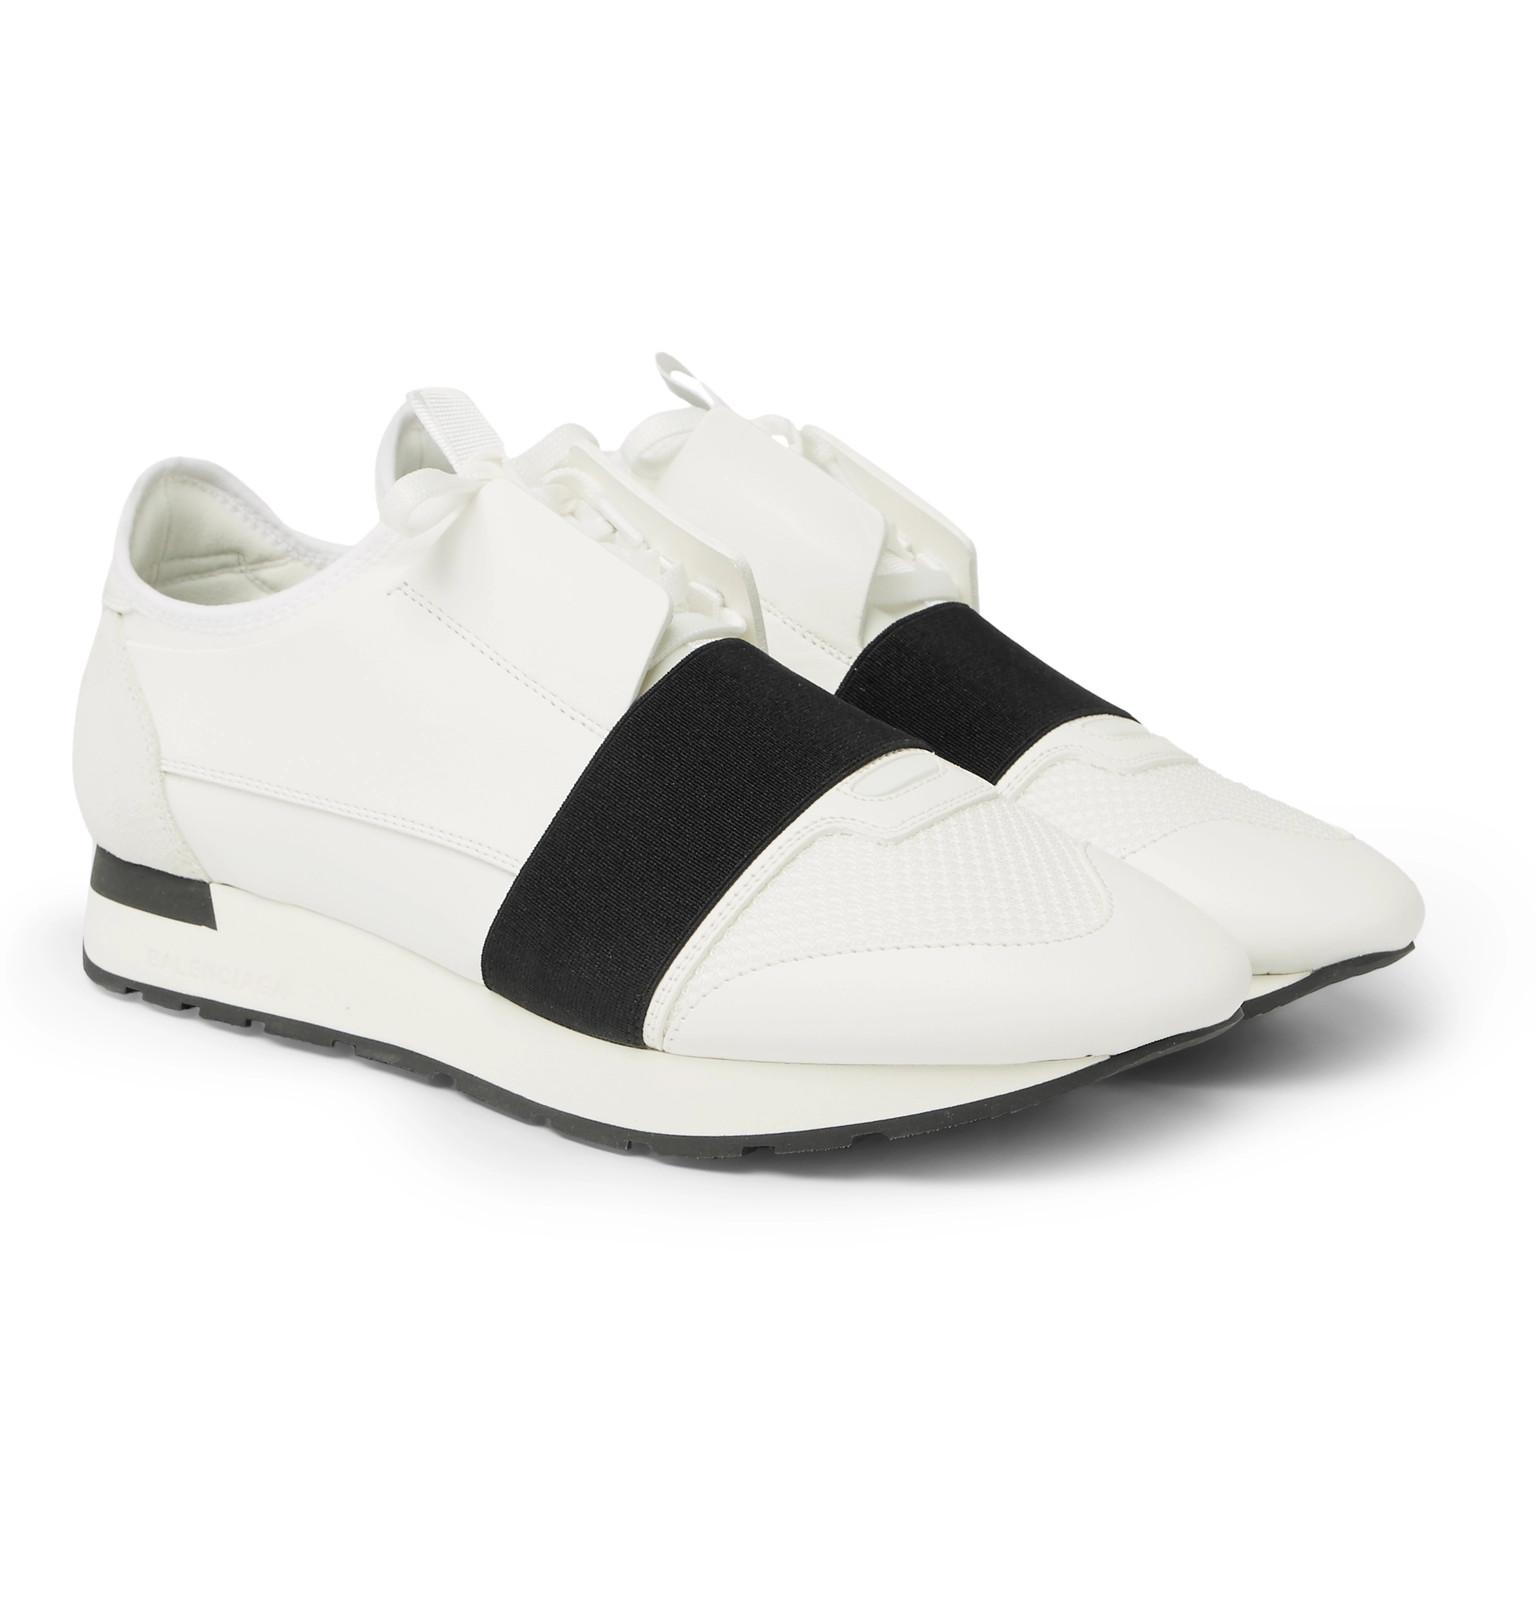 887d8ce256b3e Balenciaga - Race Runner Leather